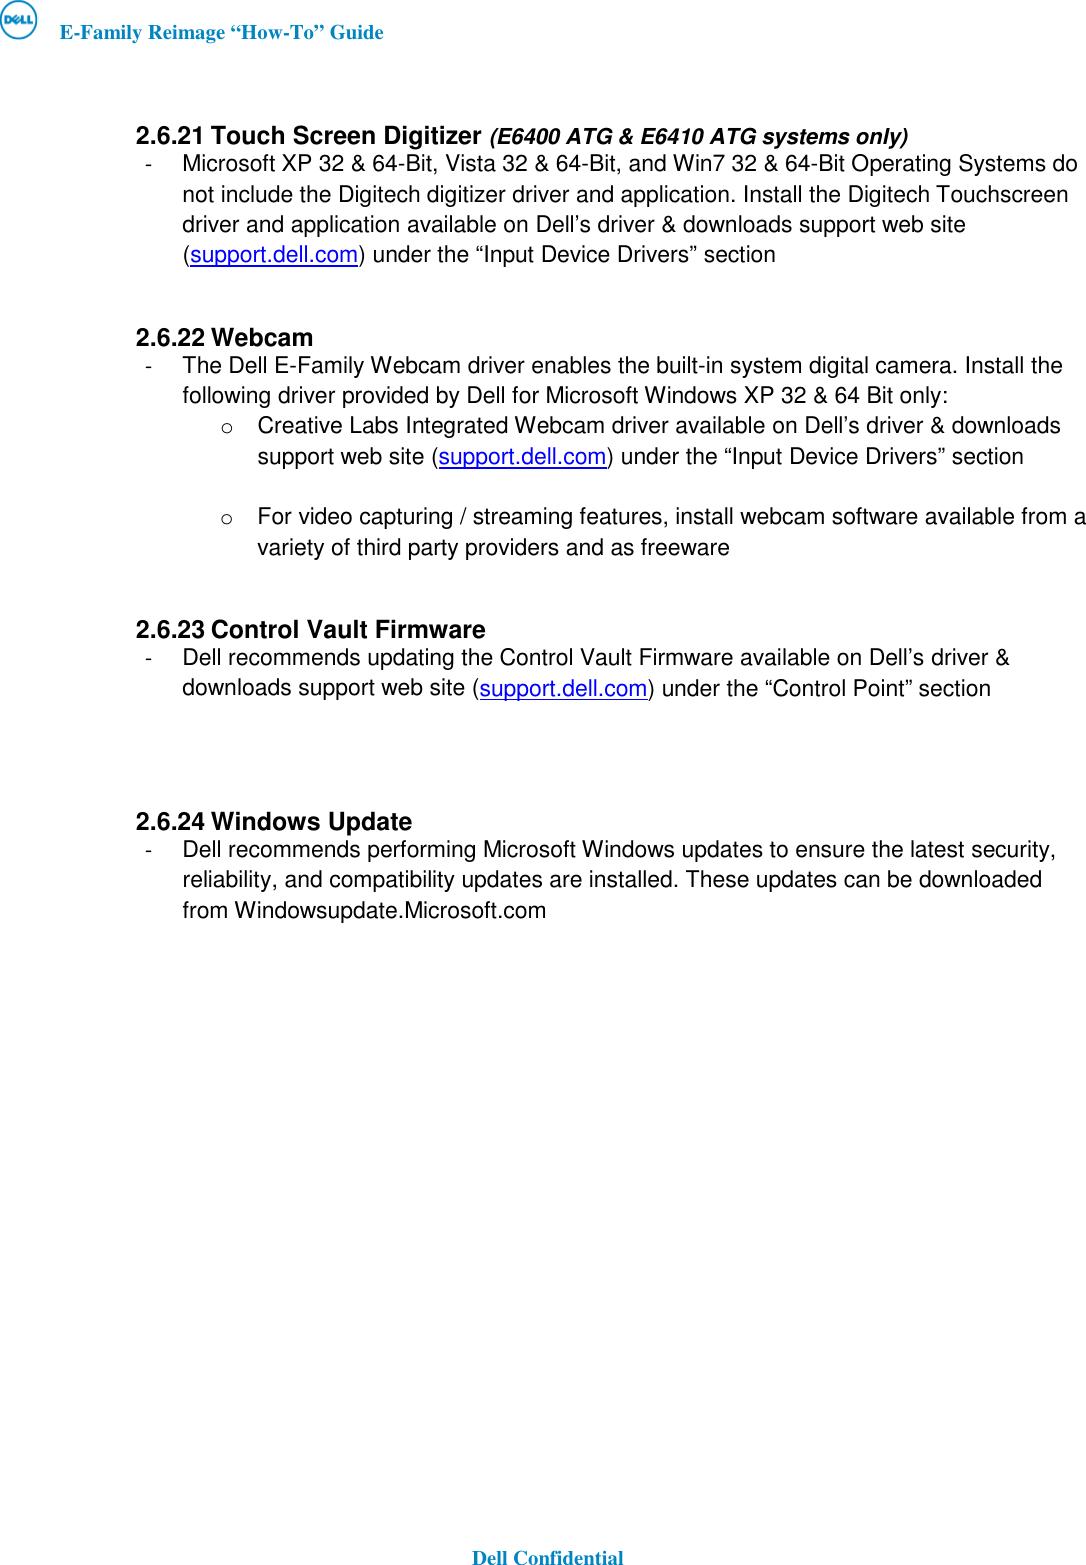 Dell Latitude E6410 Atg Owners Manual E Family Re Image Guide